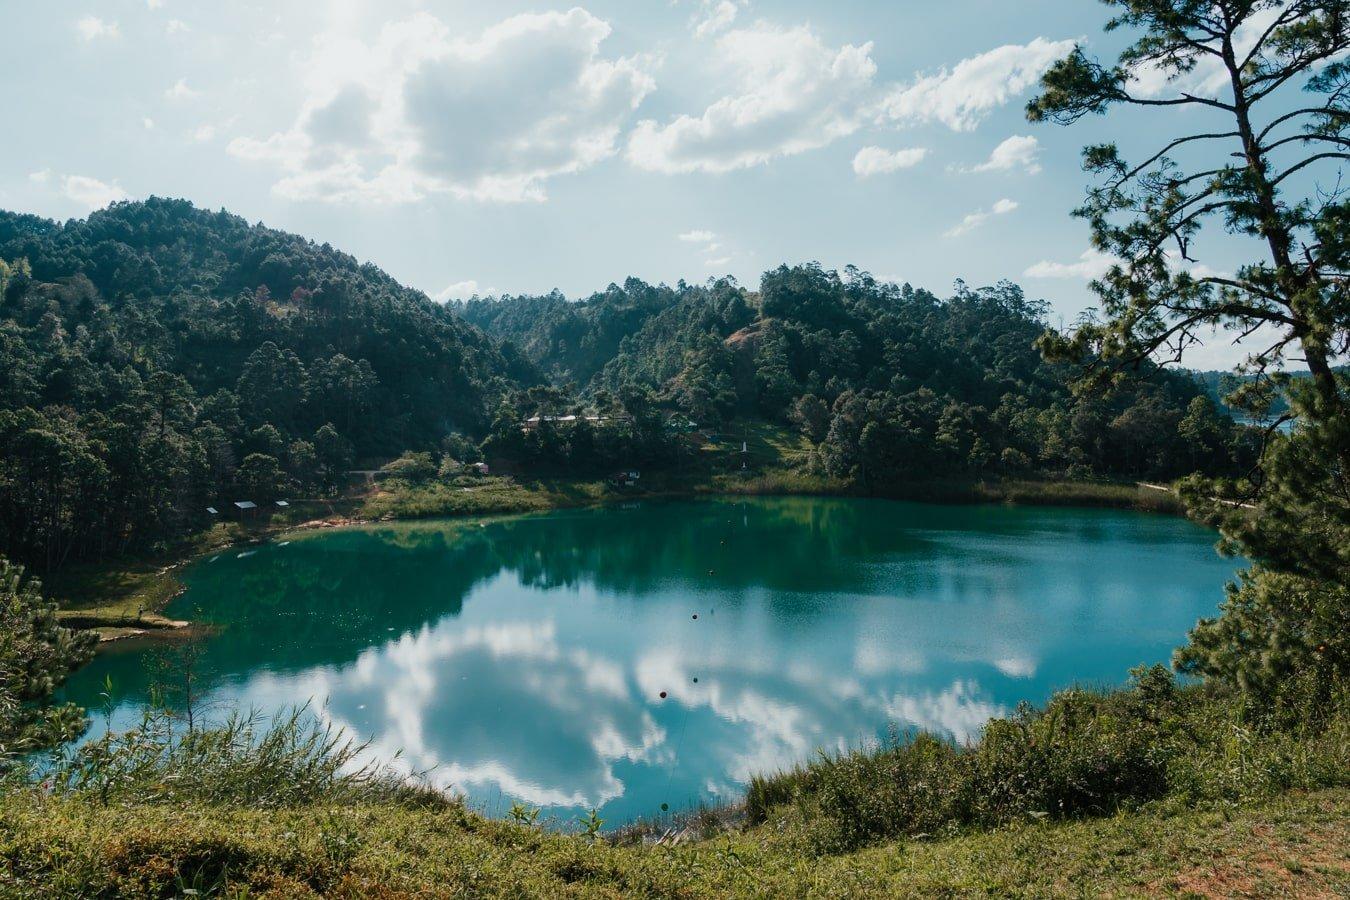 international lake on mexico-guatemalan border